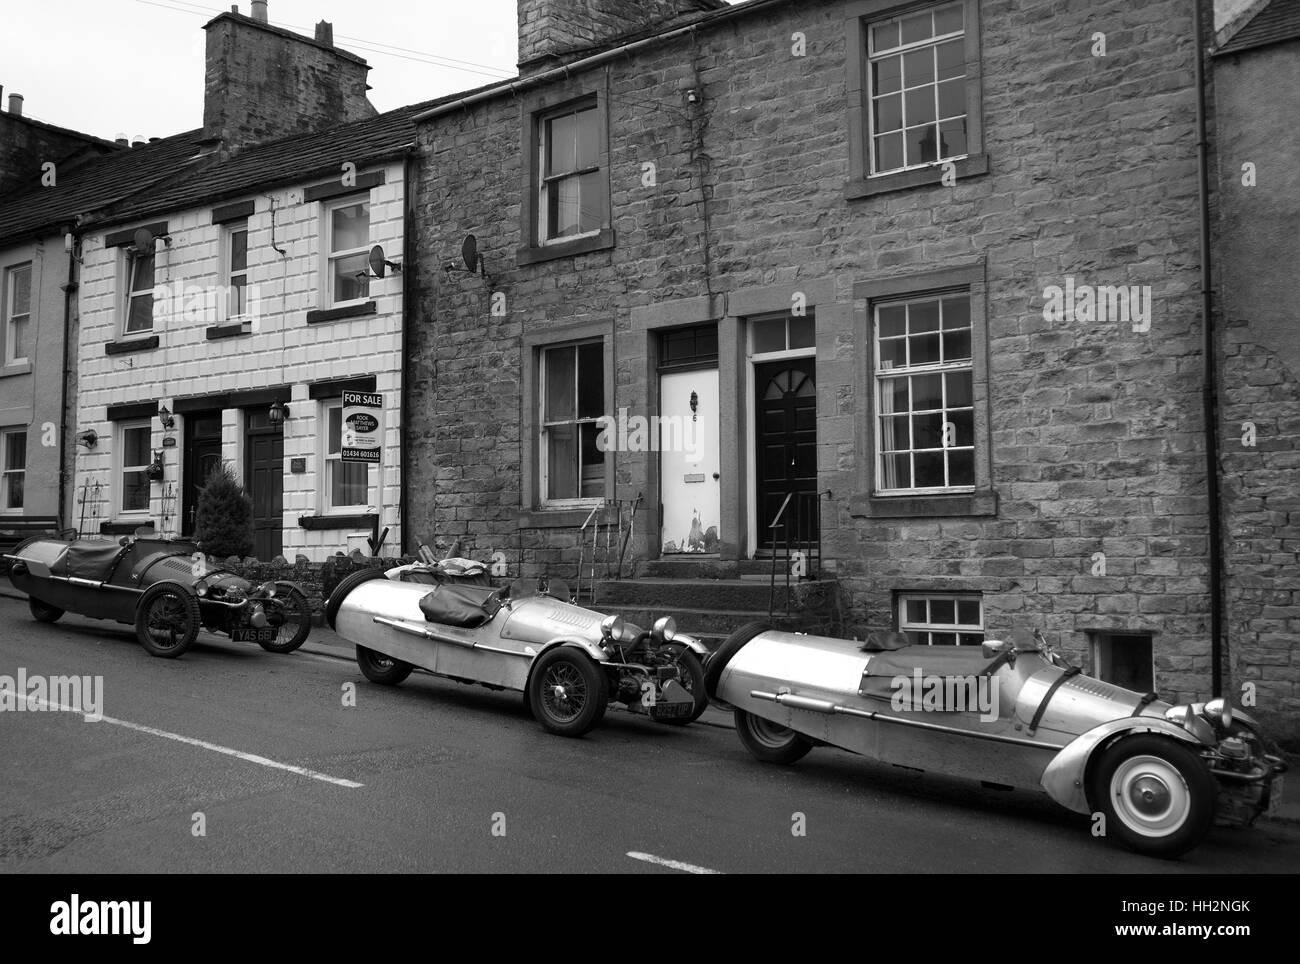 Pembleton 3 wheeled sports cars in Alston - Stock Image